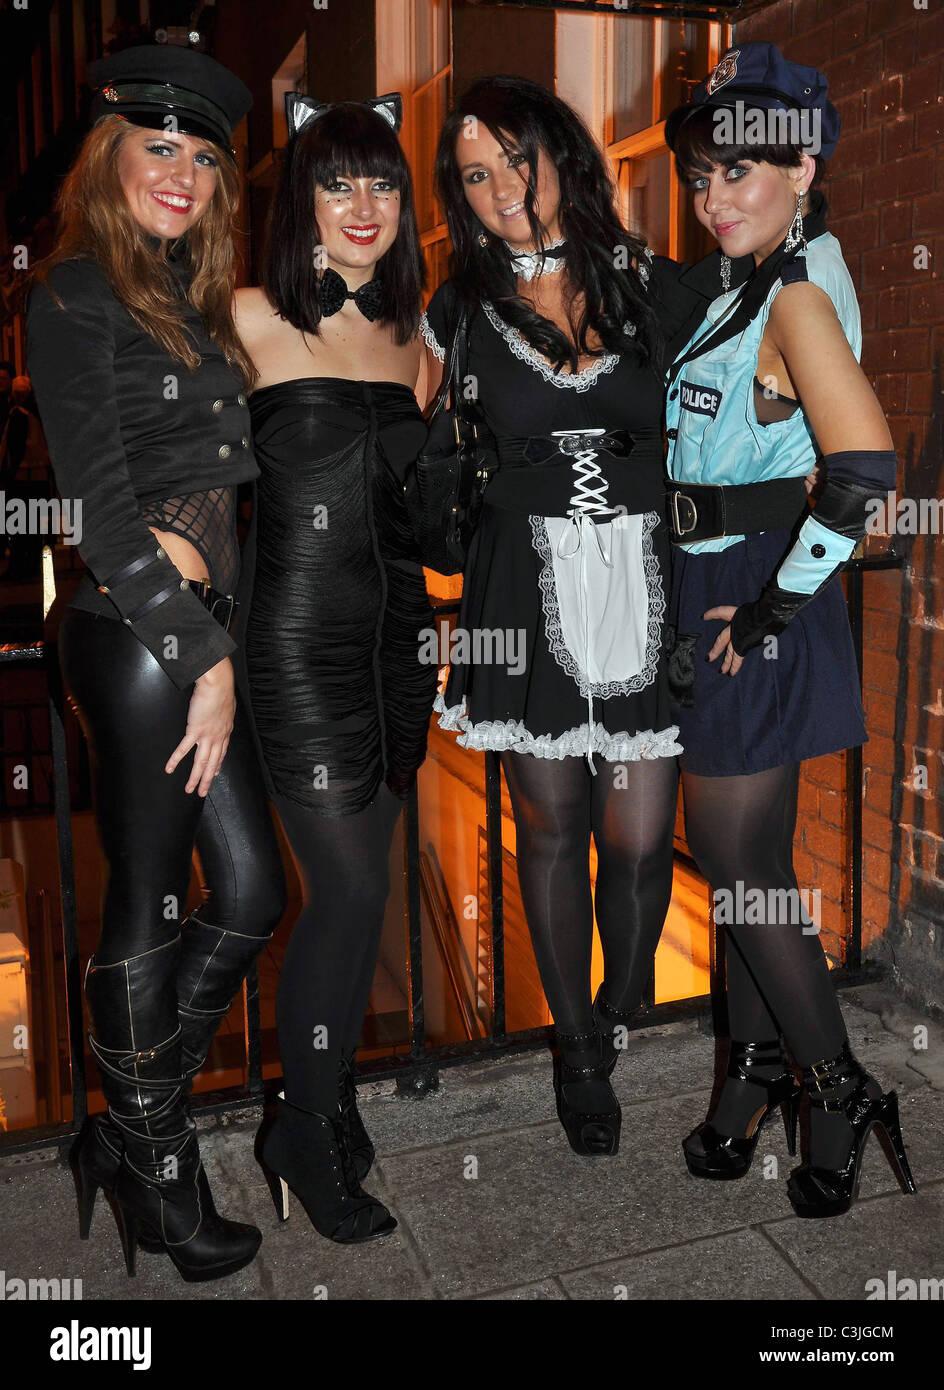 Hilary Fallon, Erica Leahy, Alina Bachlina, Sasha Coen arrives to ...